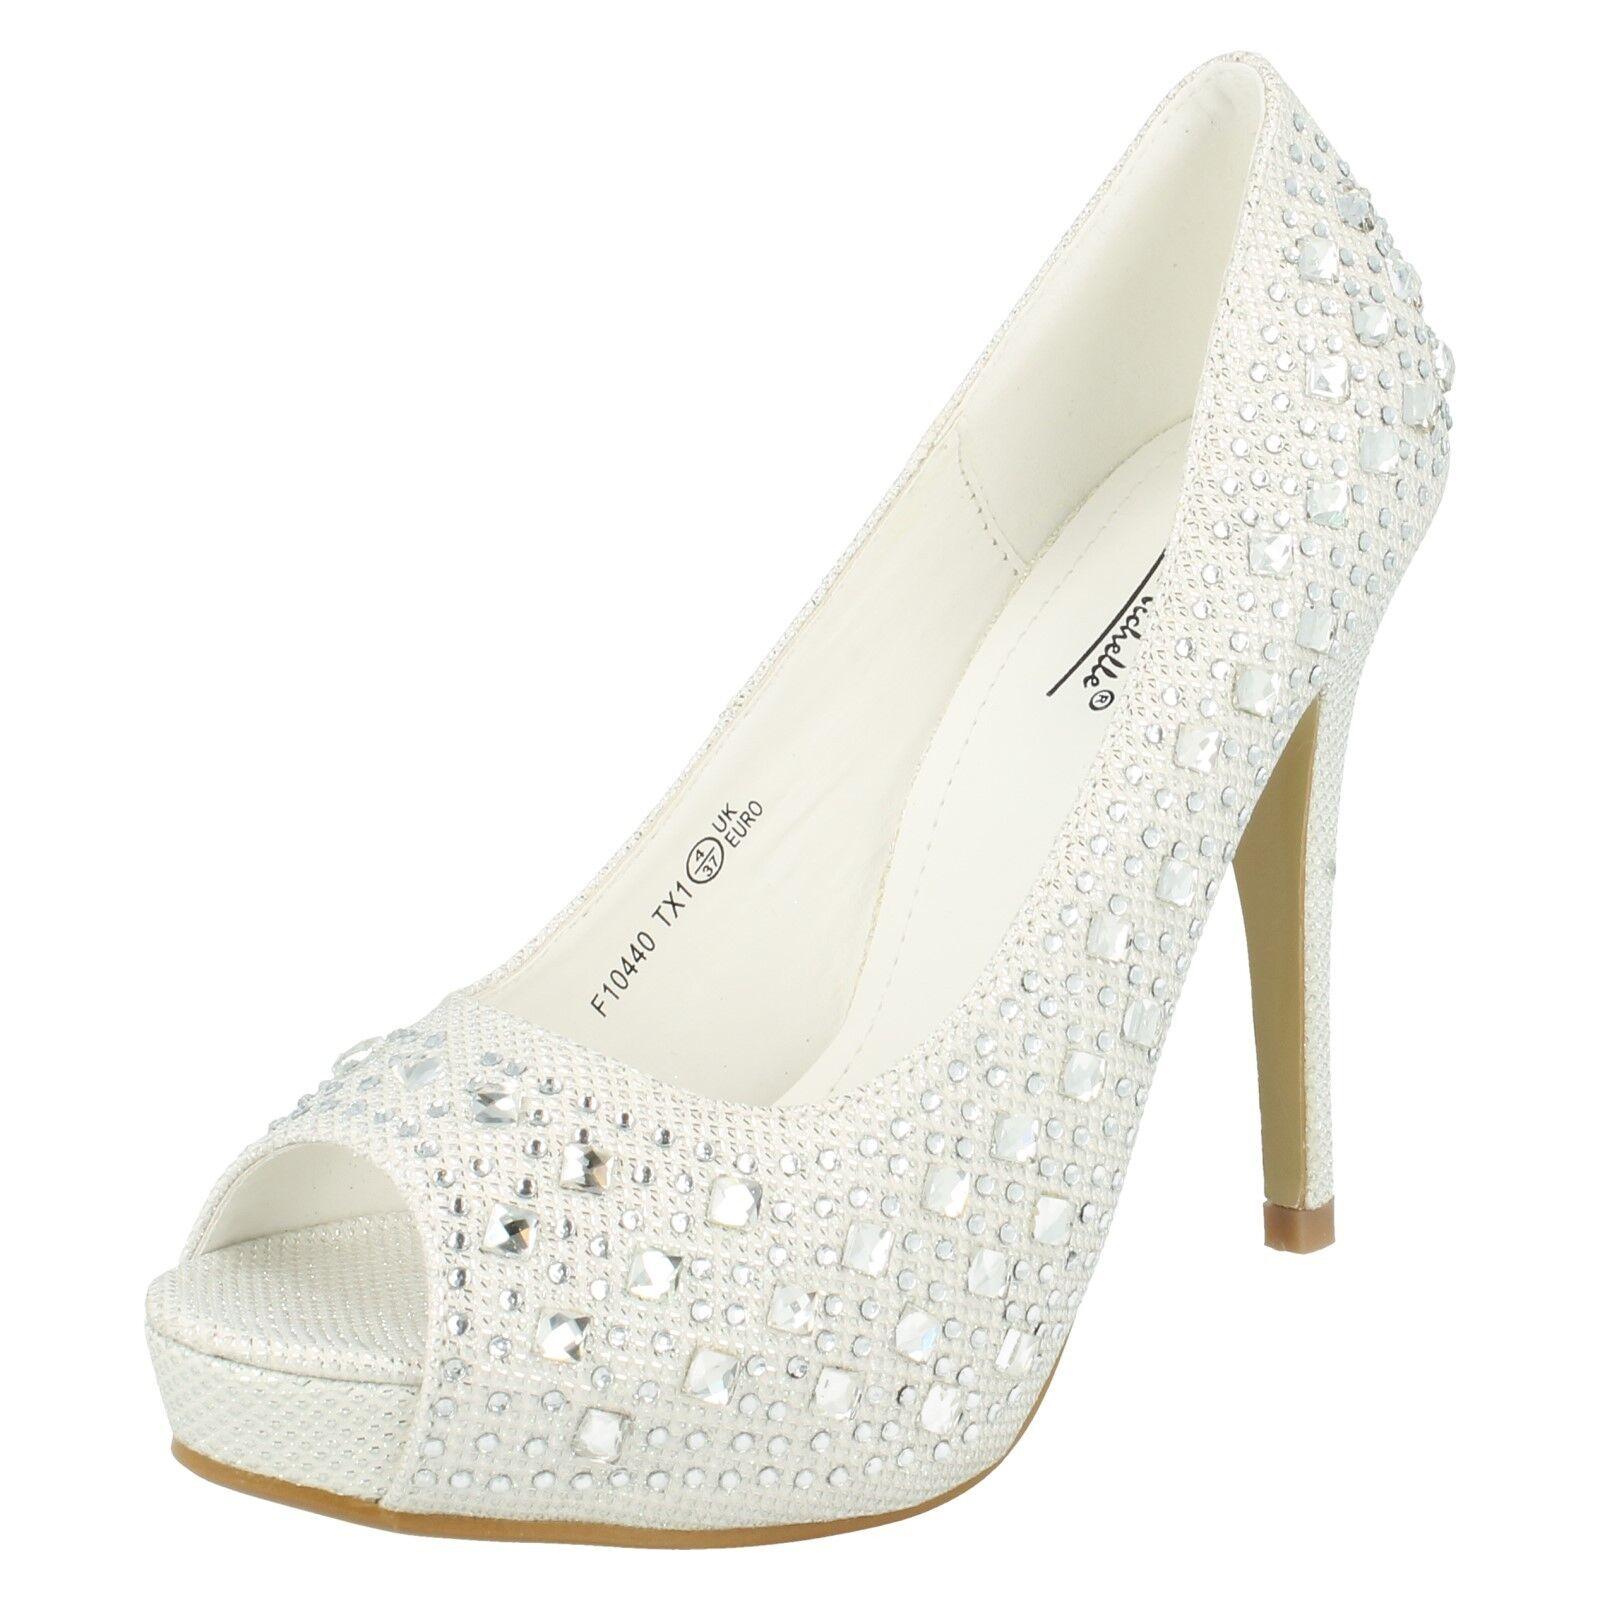 LADIES ANNE MICHELLE PEEP TOE HIGH HEEL WHITE GLITTER COURT SHOES F10440